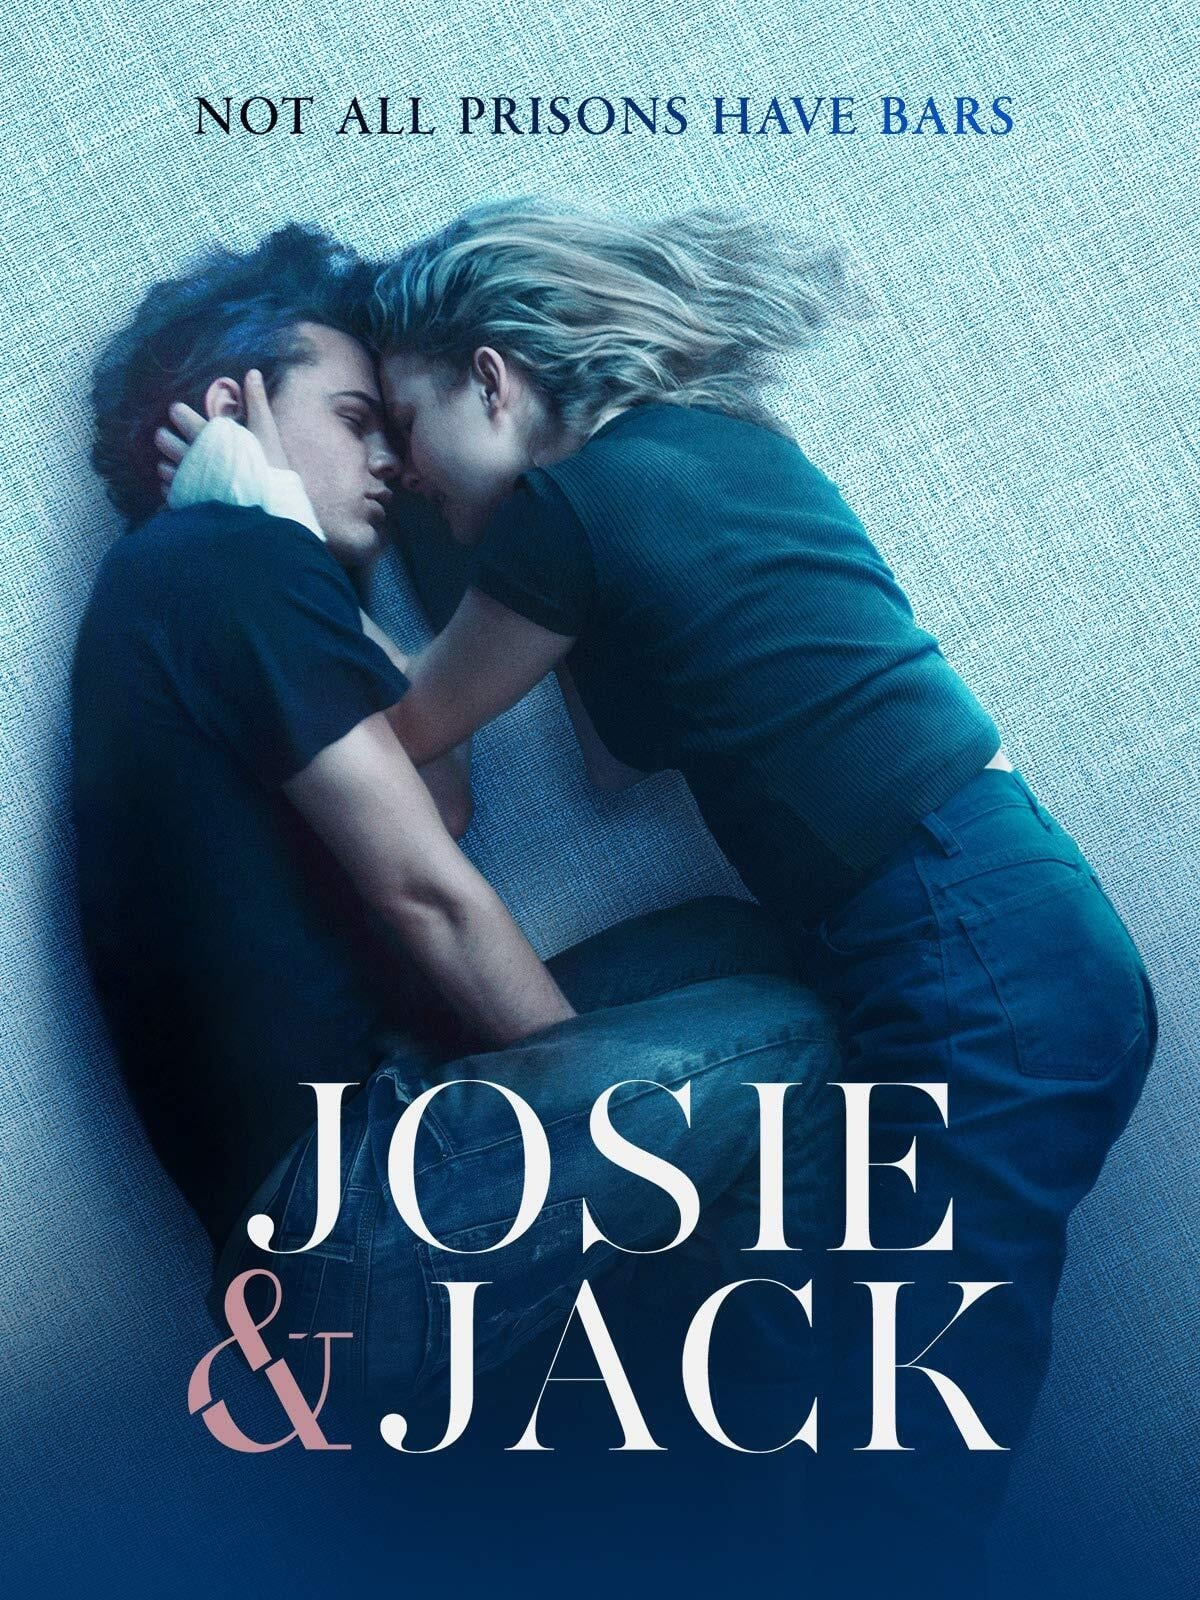 Josie & Jack on FREECABLE TV